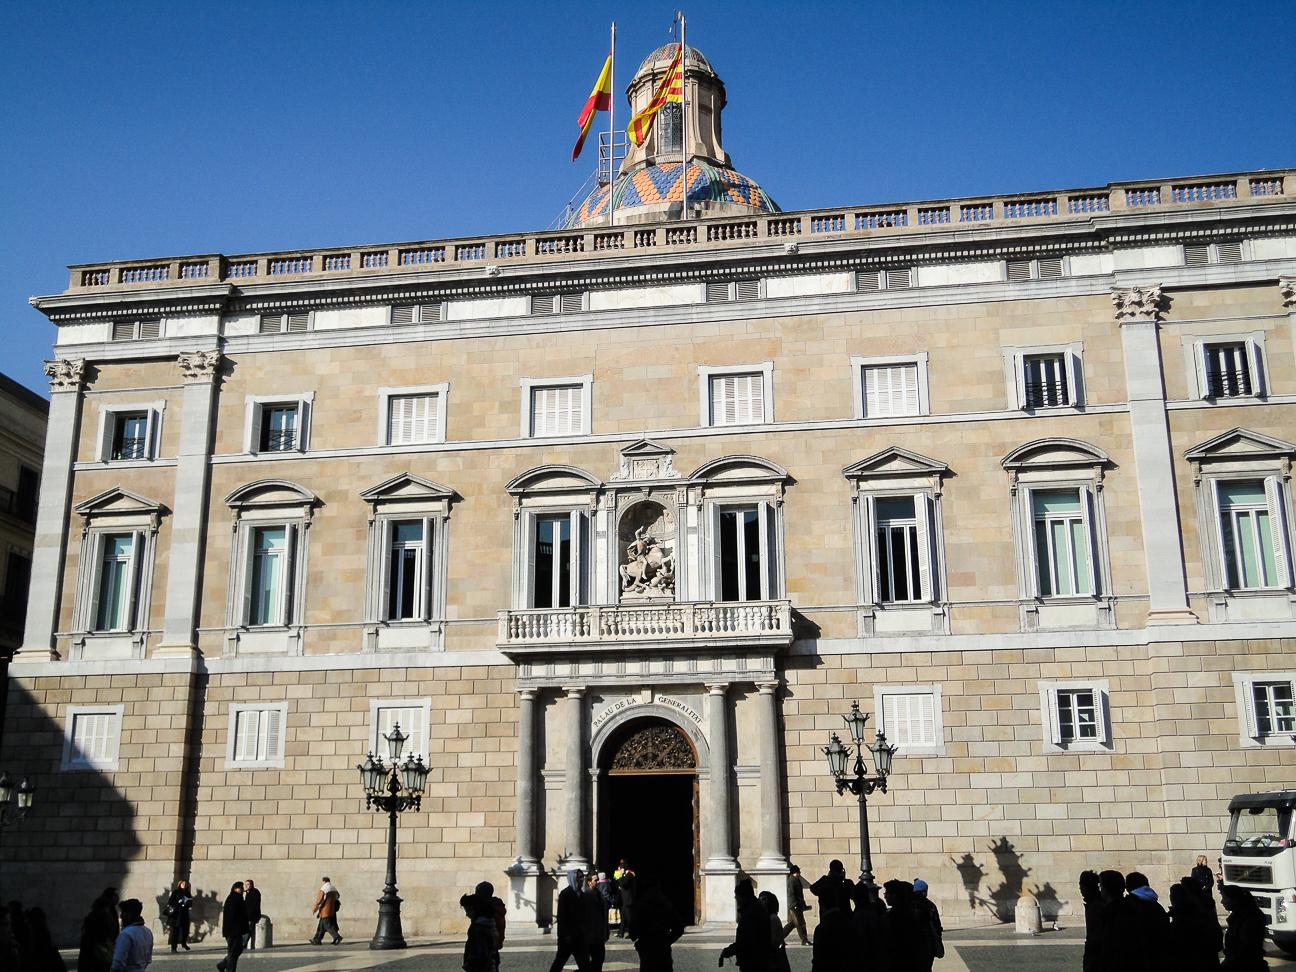 Que hacer en Barcelona - Palau de la Generalitat